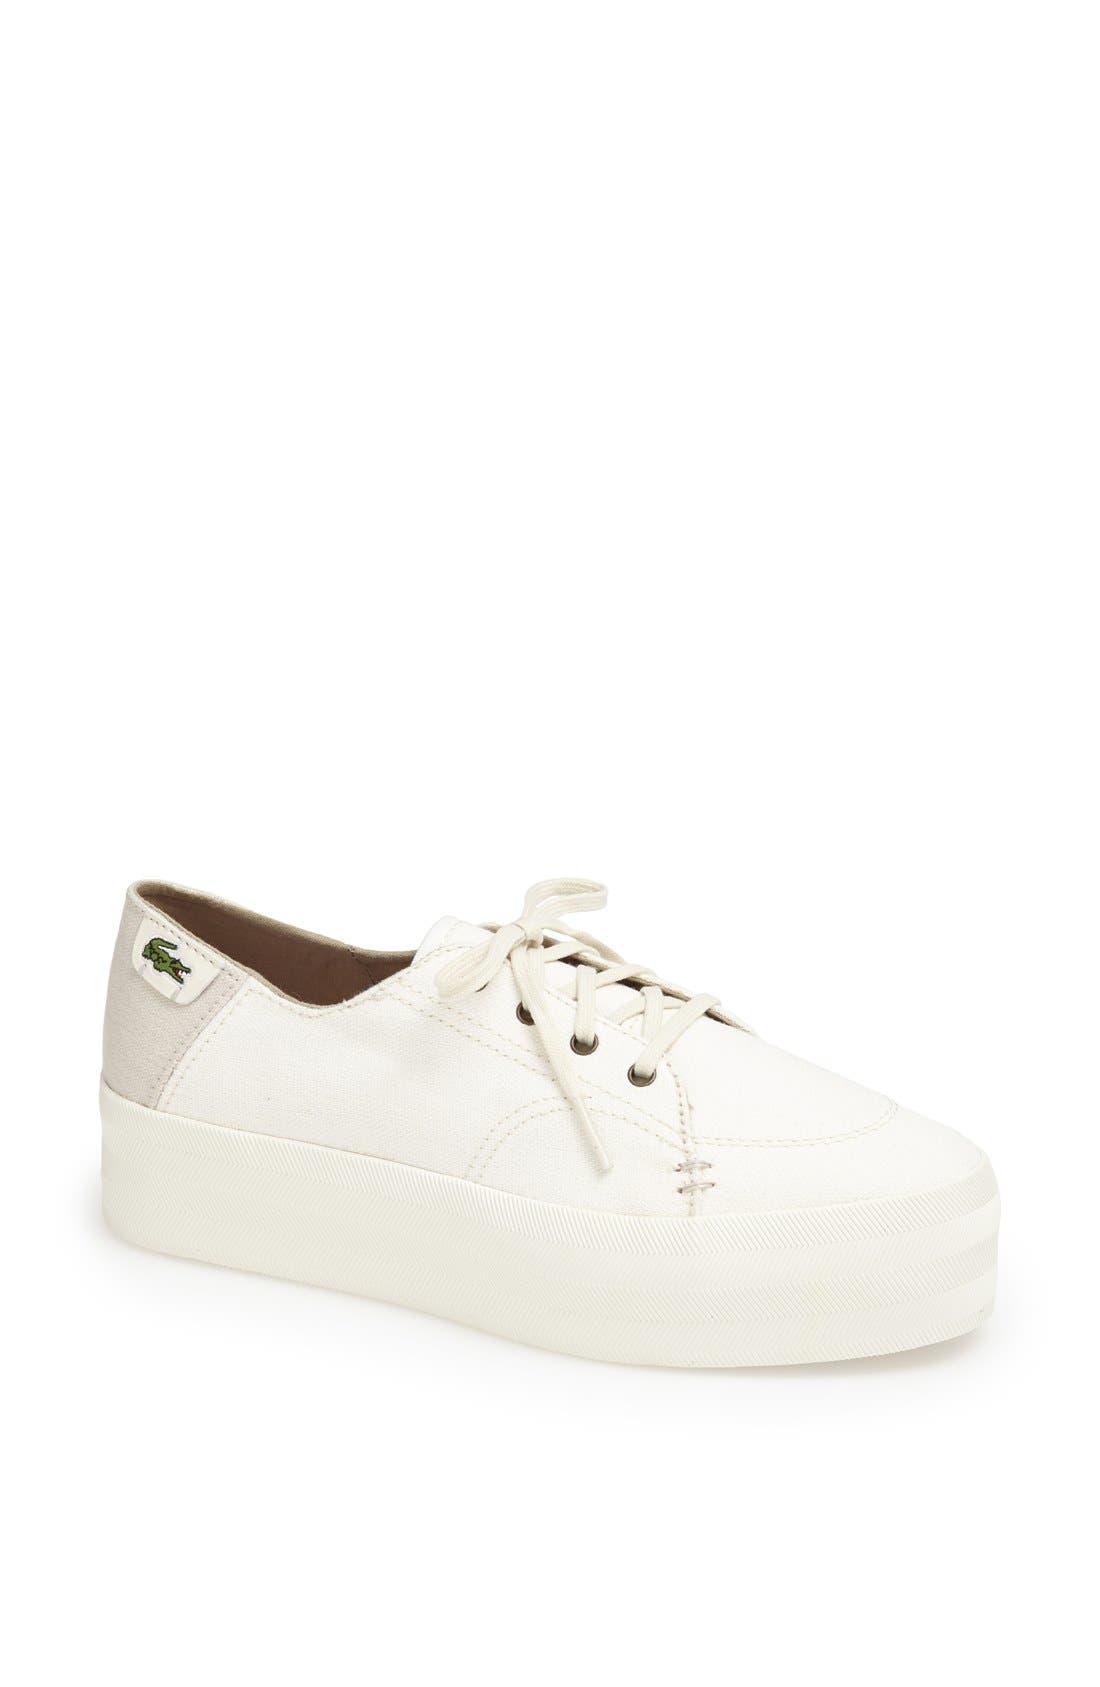 Alternate Image 1 Selected - Lacoste 'Kirton' Platform Sneaker (Women) (Online Exclusive)